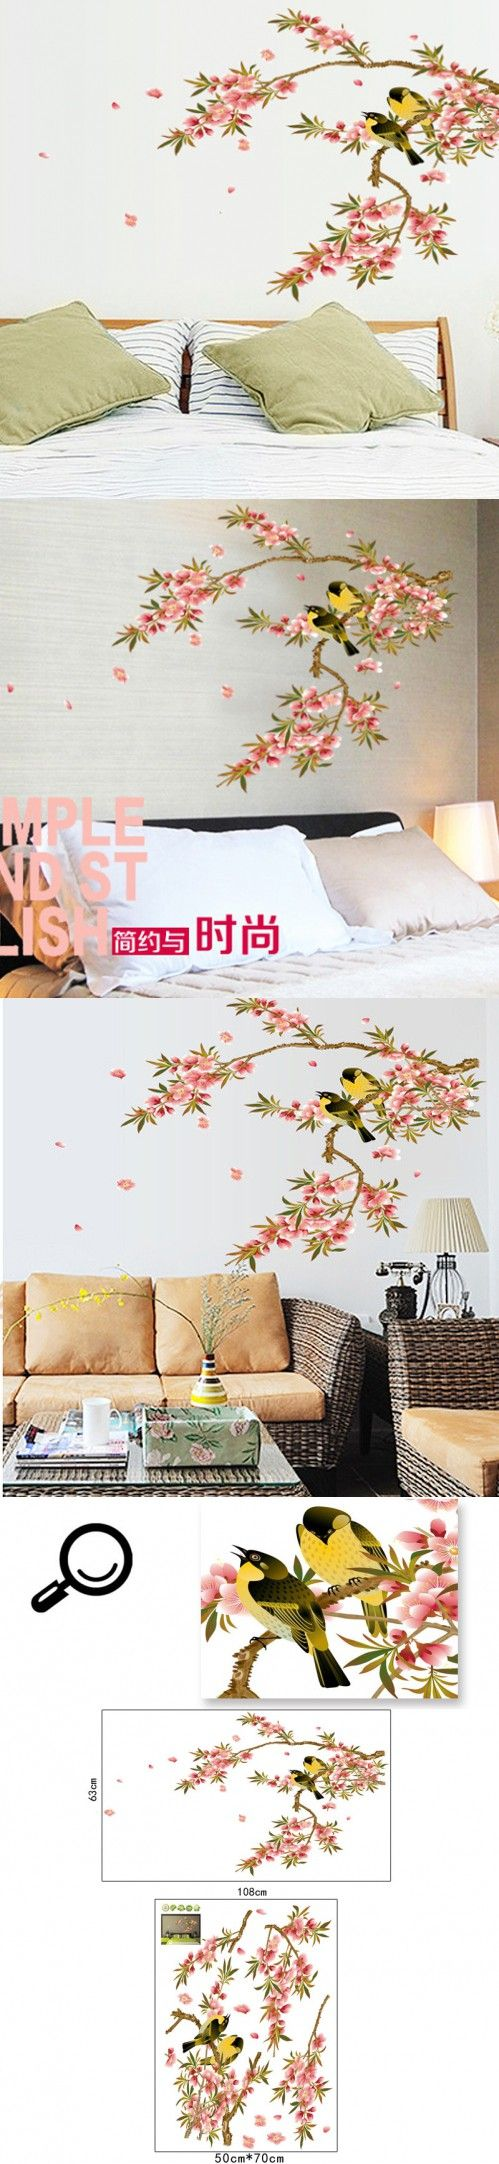 best 20 pvc mural ideas on pinterest meubles de tuyaux en pvc saturday monopoly bird standing on branch cartoon children wall stickers pvc murals nursery kids